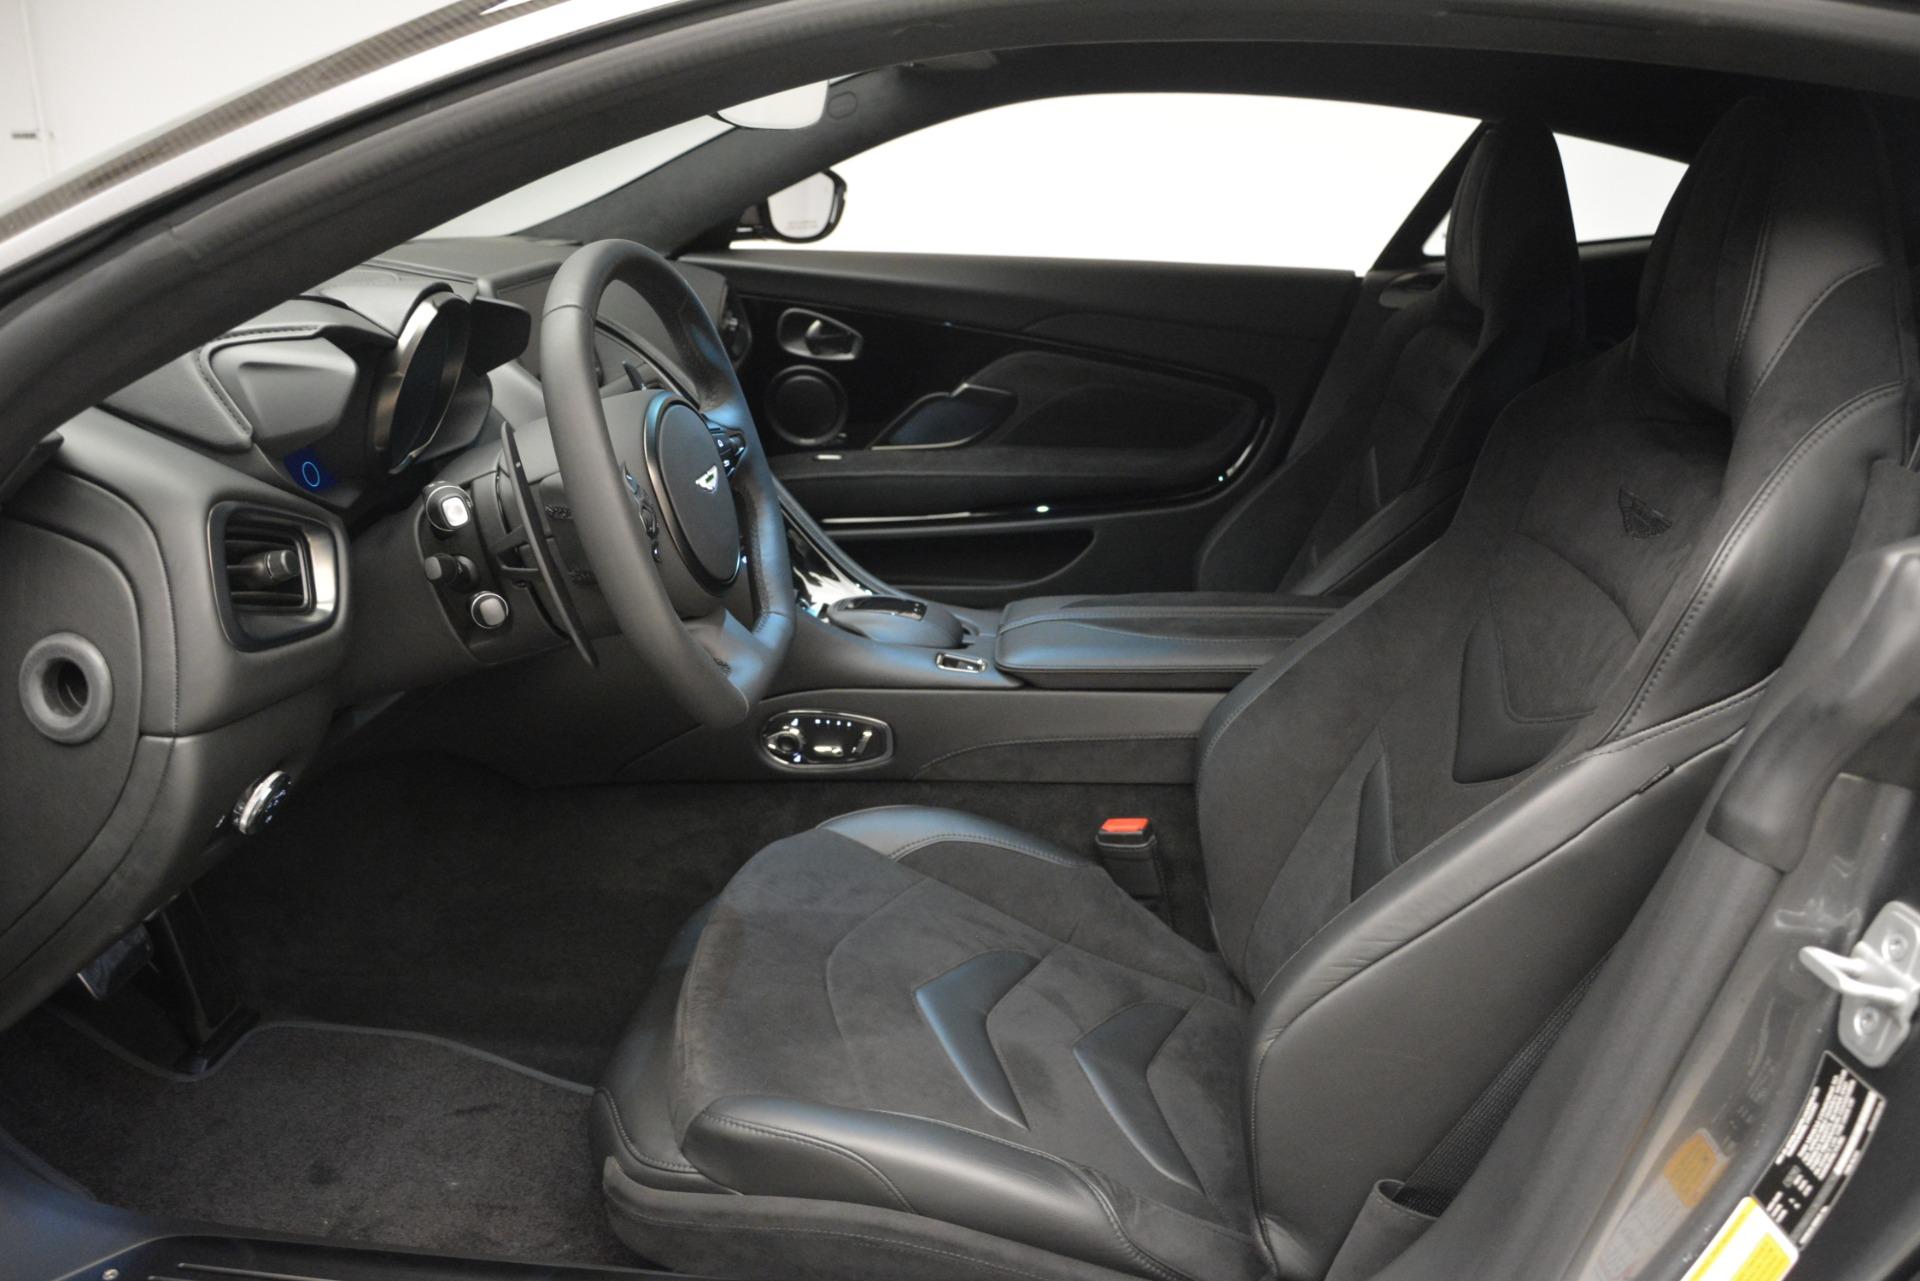 Used 2019 Aston Martin DBS Superleggera Coupe For Sale In Greenwich, CT 2917_p15